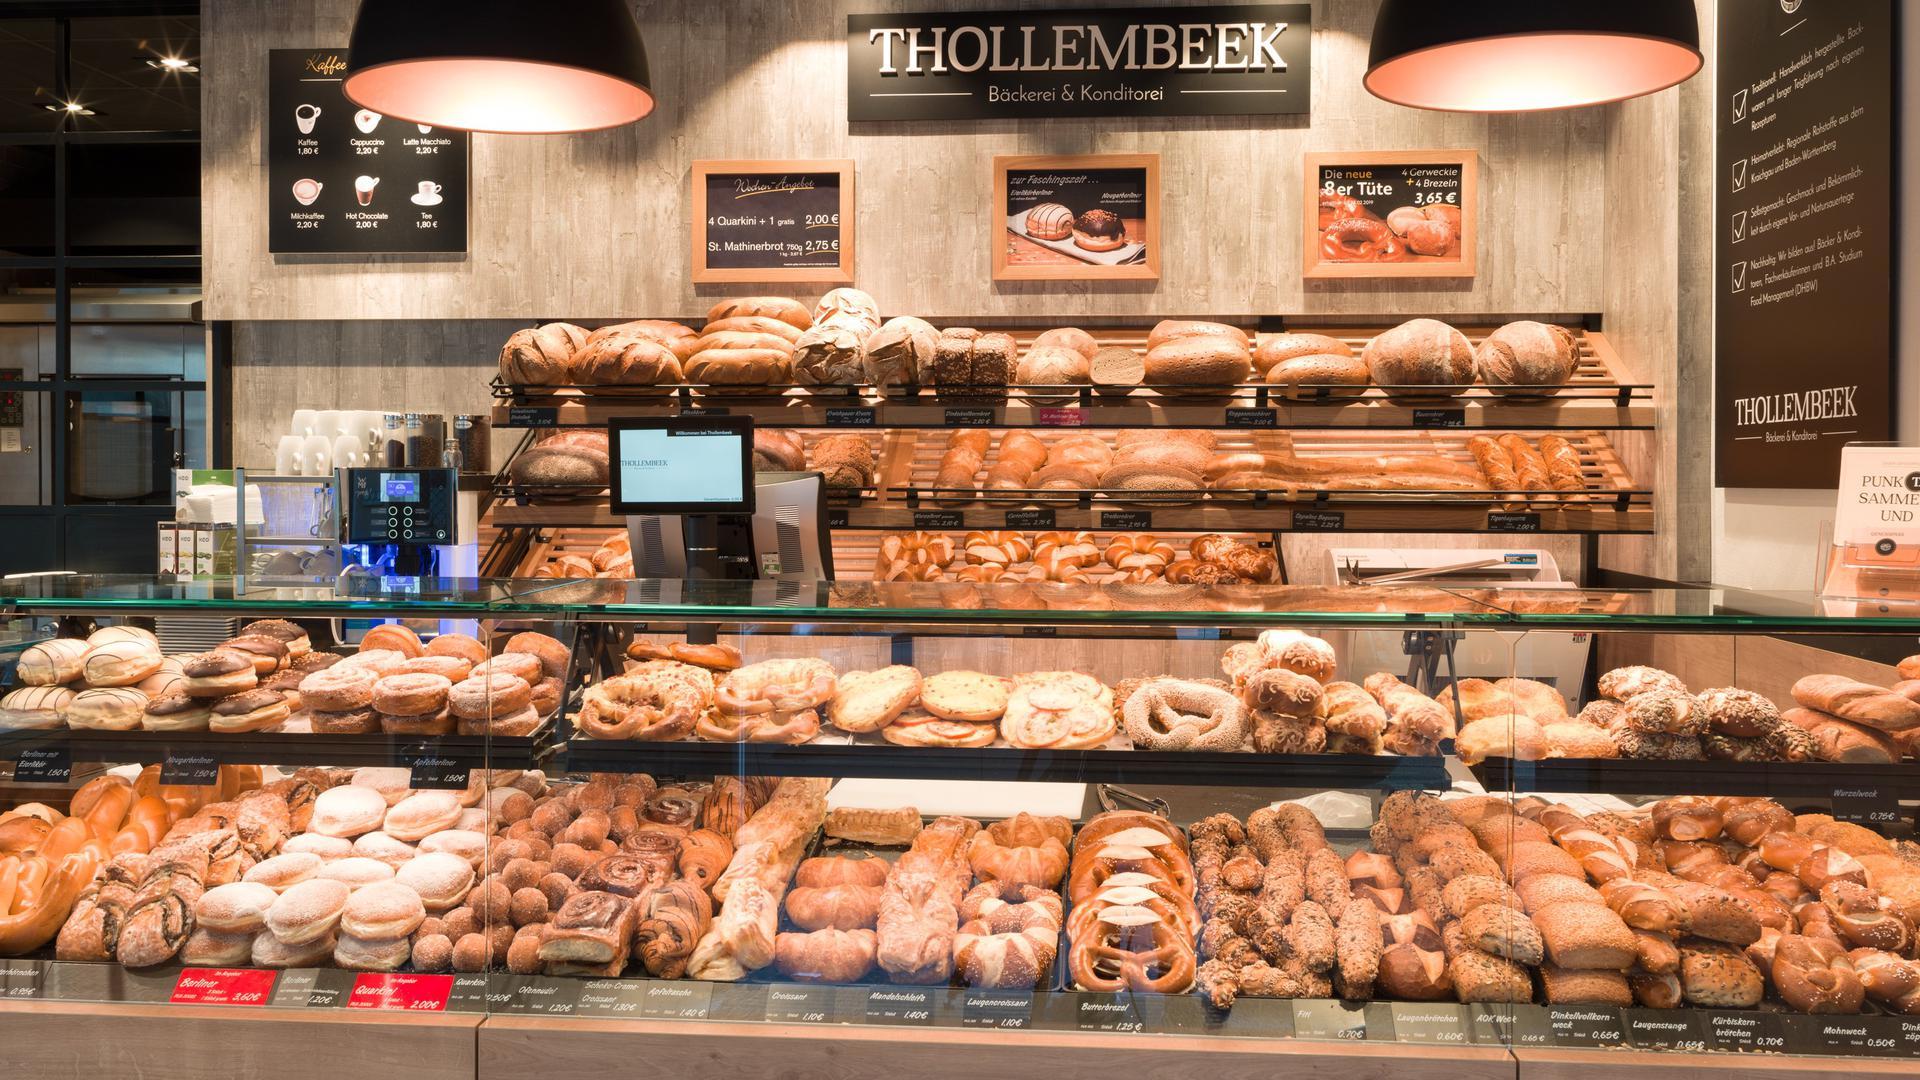 Bäckerei Thollembeek